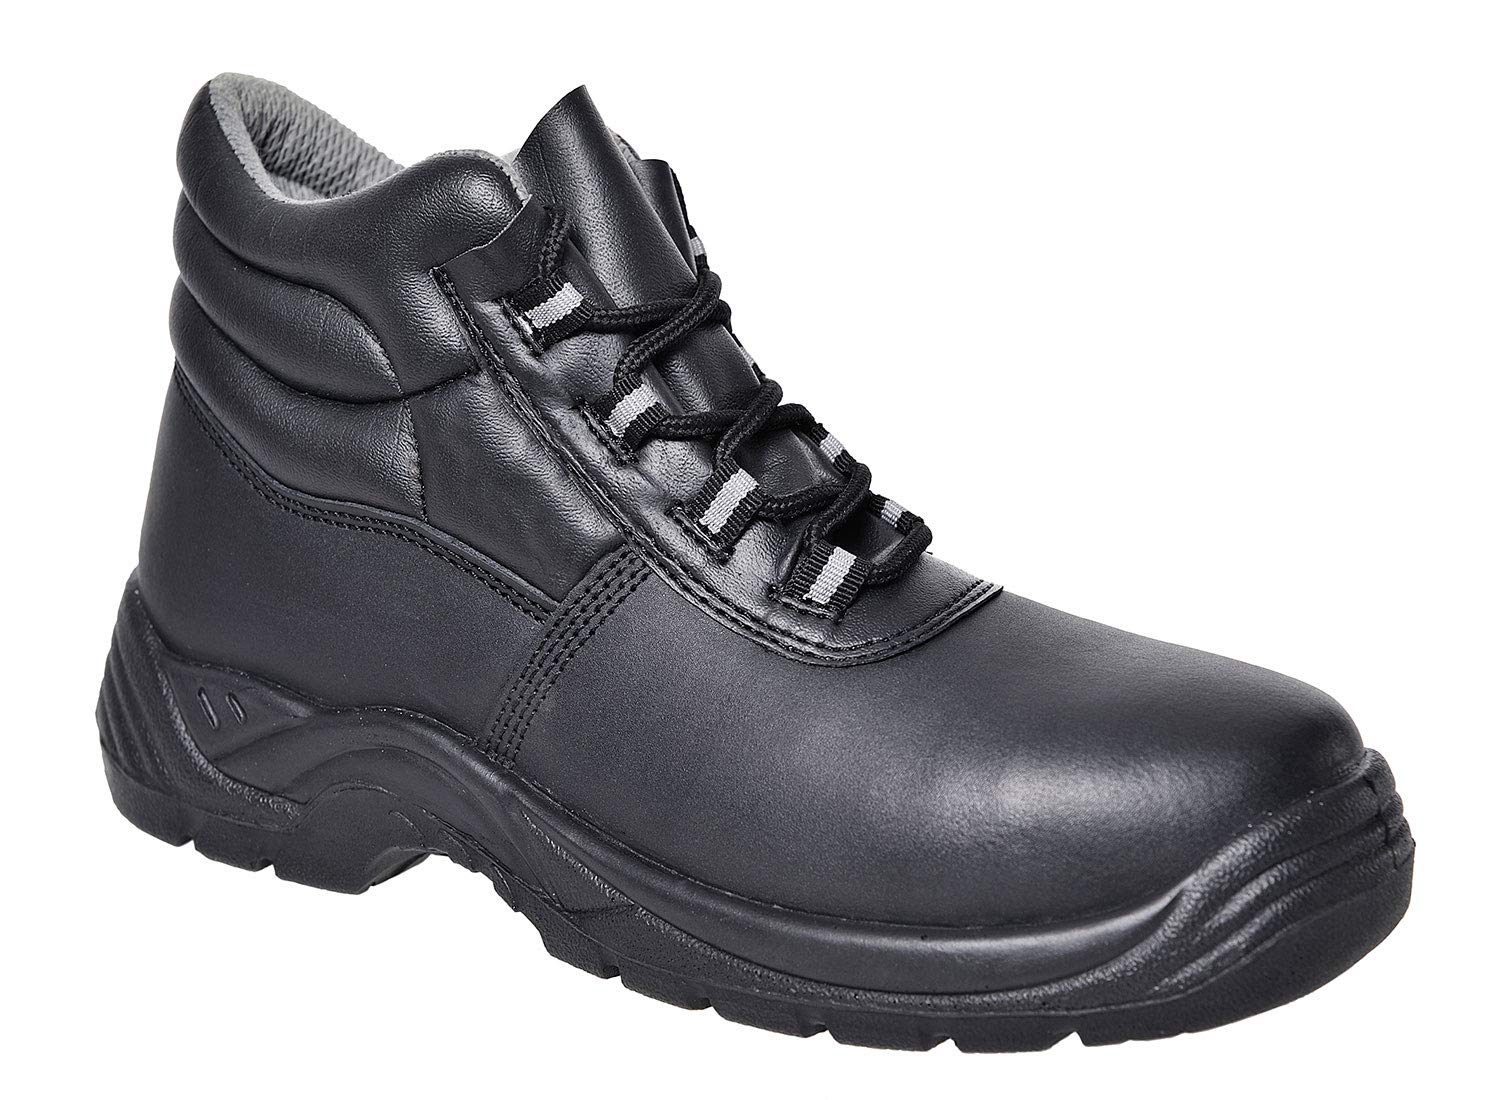 Portwest FC21BKR38 Compositelite Boot 38/5, 5, Black